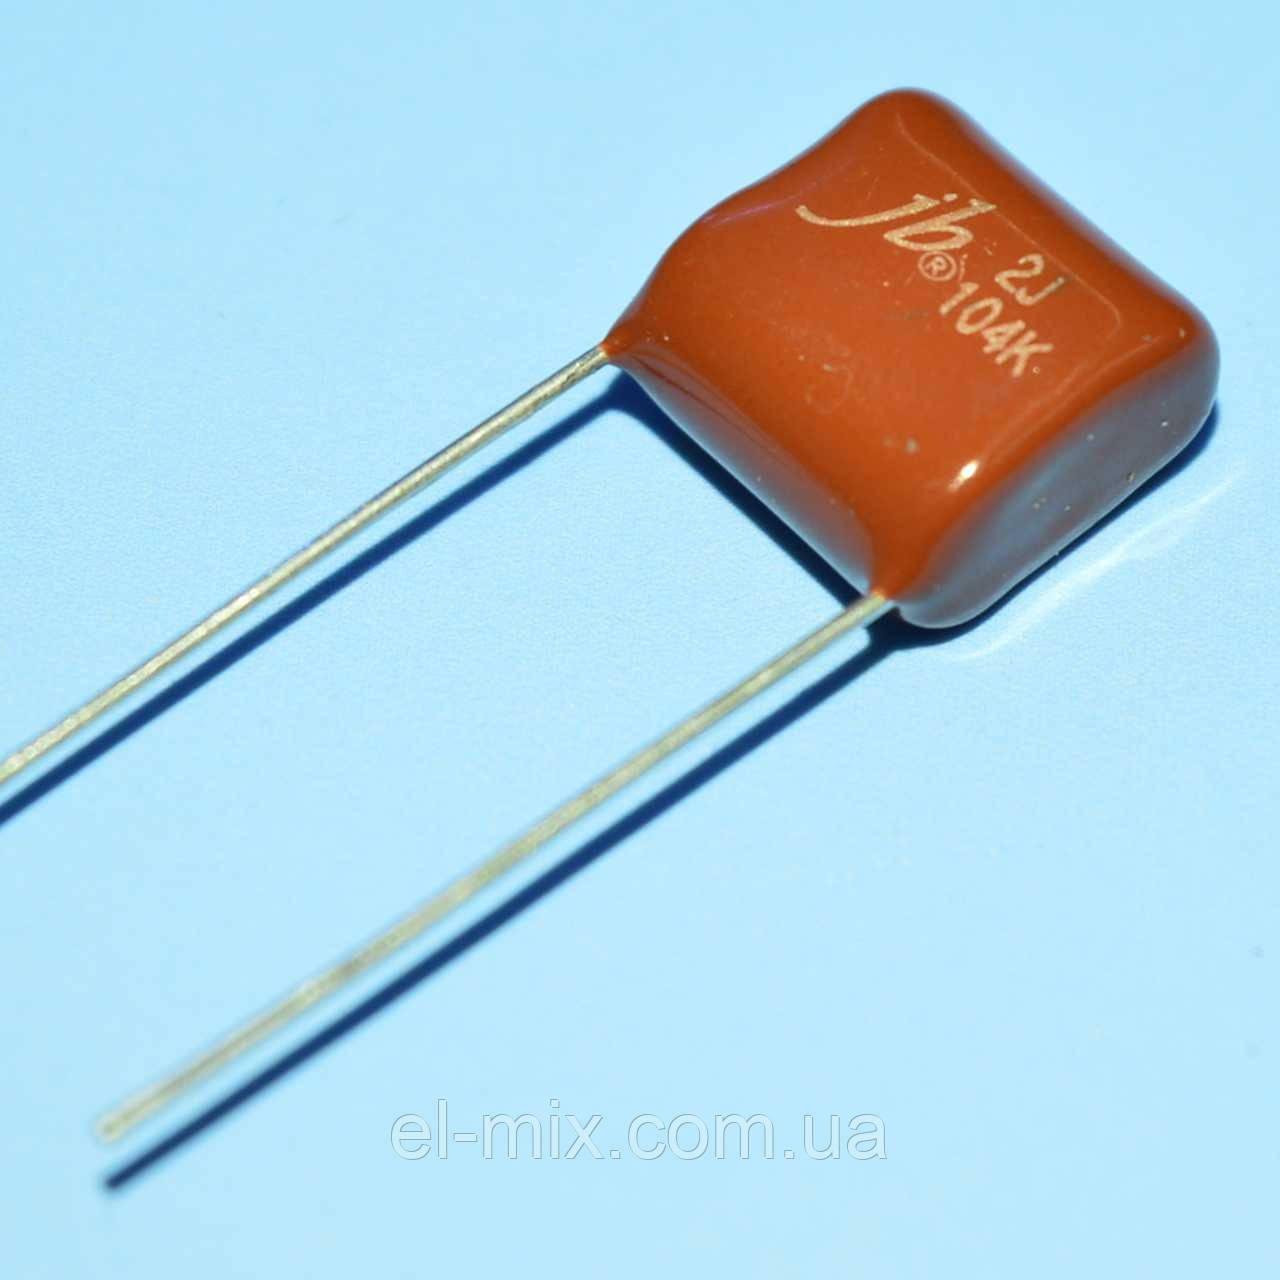 Конденсатор металлопленочный CL-21  0.1 µF 630V(2J) ±10%  JB